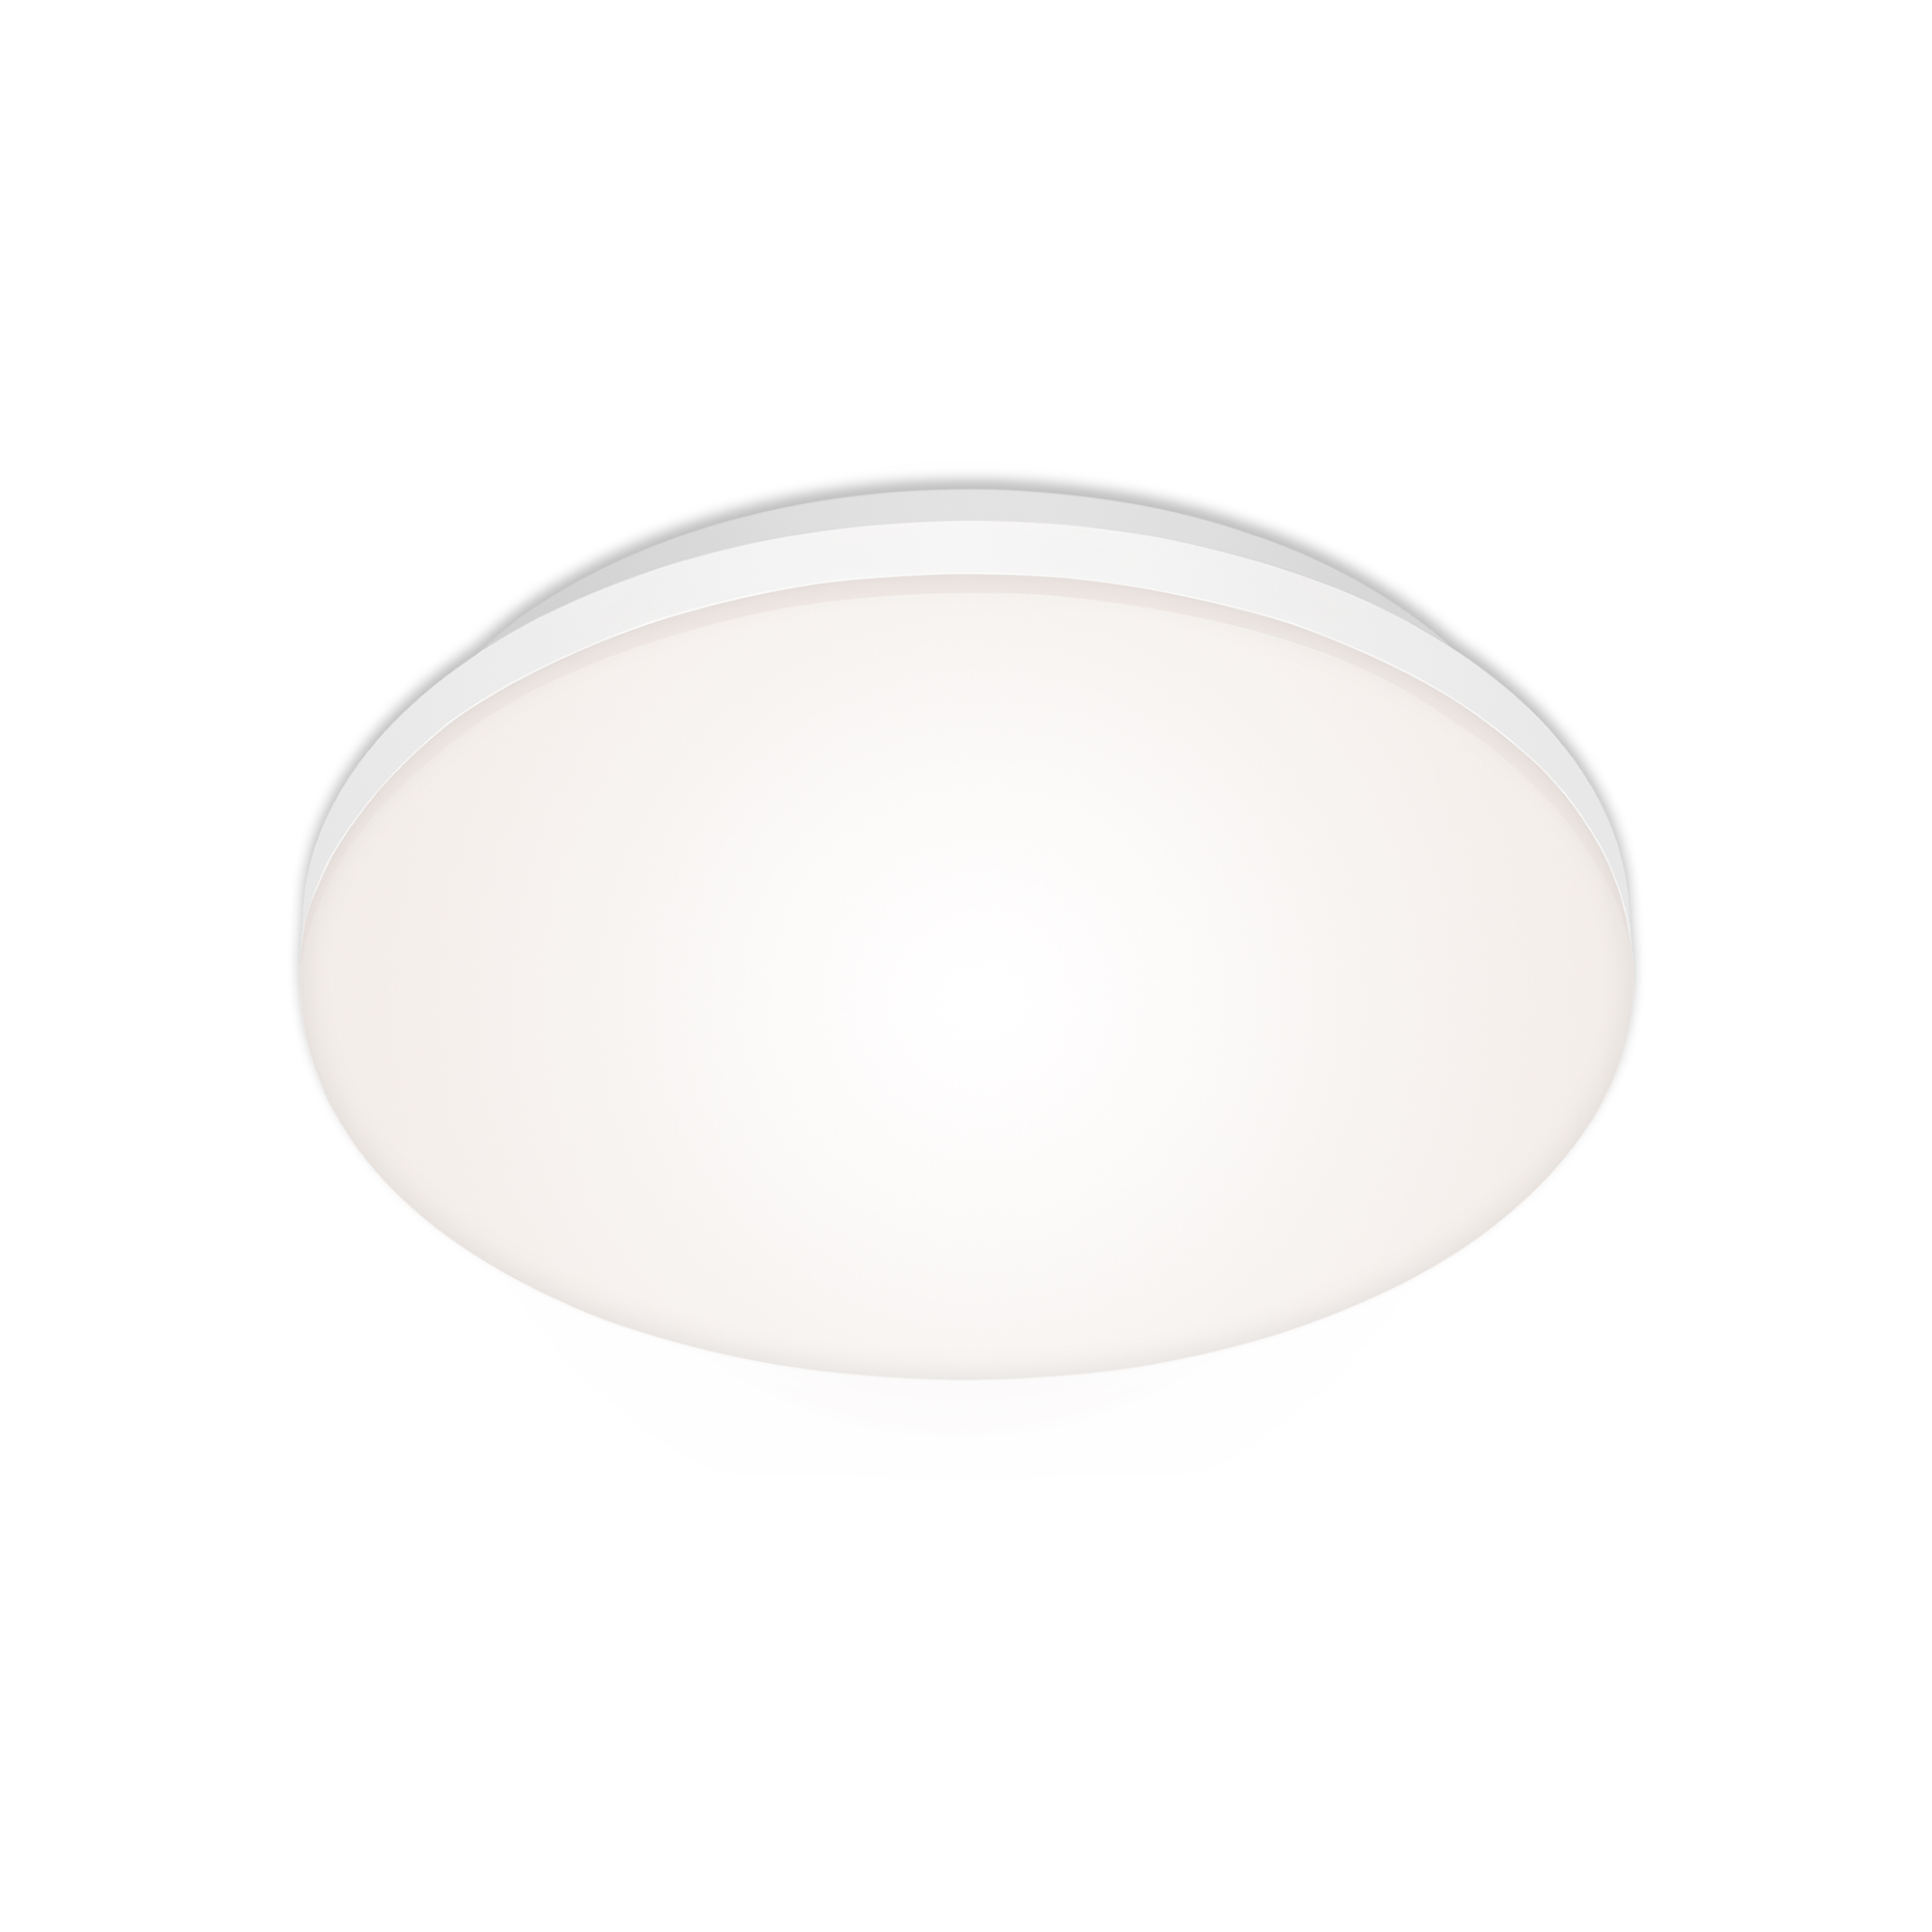 FRAMELESS LED Panel, Ø 30 cm, 1600 LUMEN, 12 WATT, Weiß